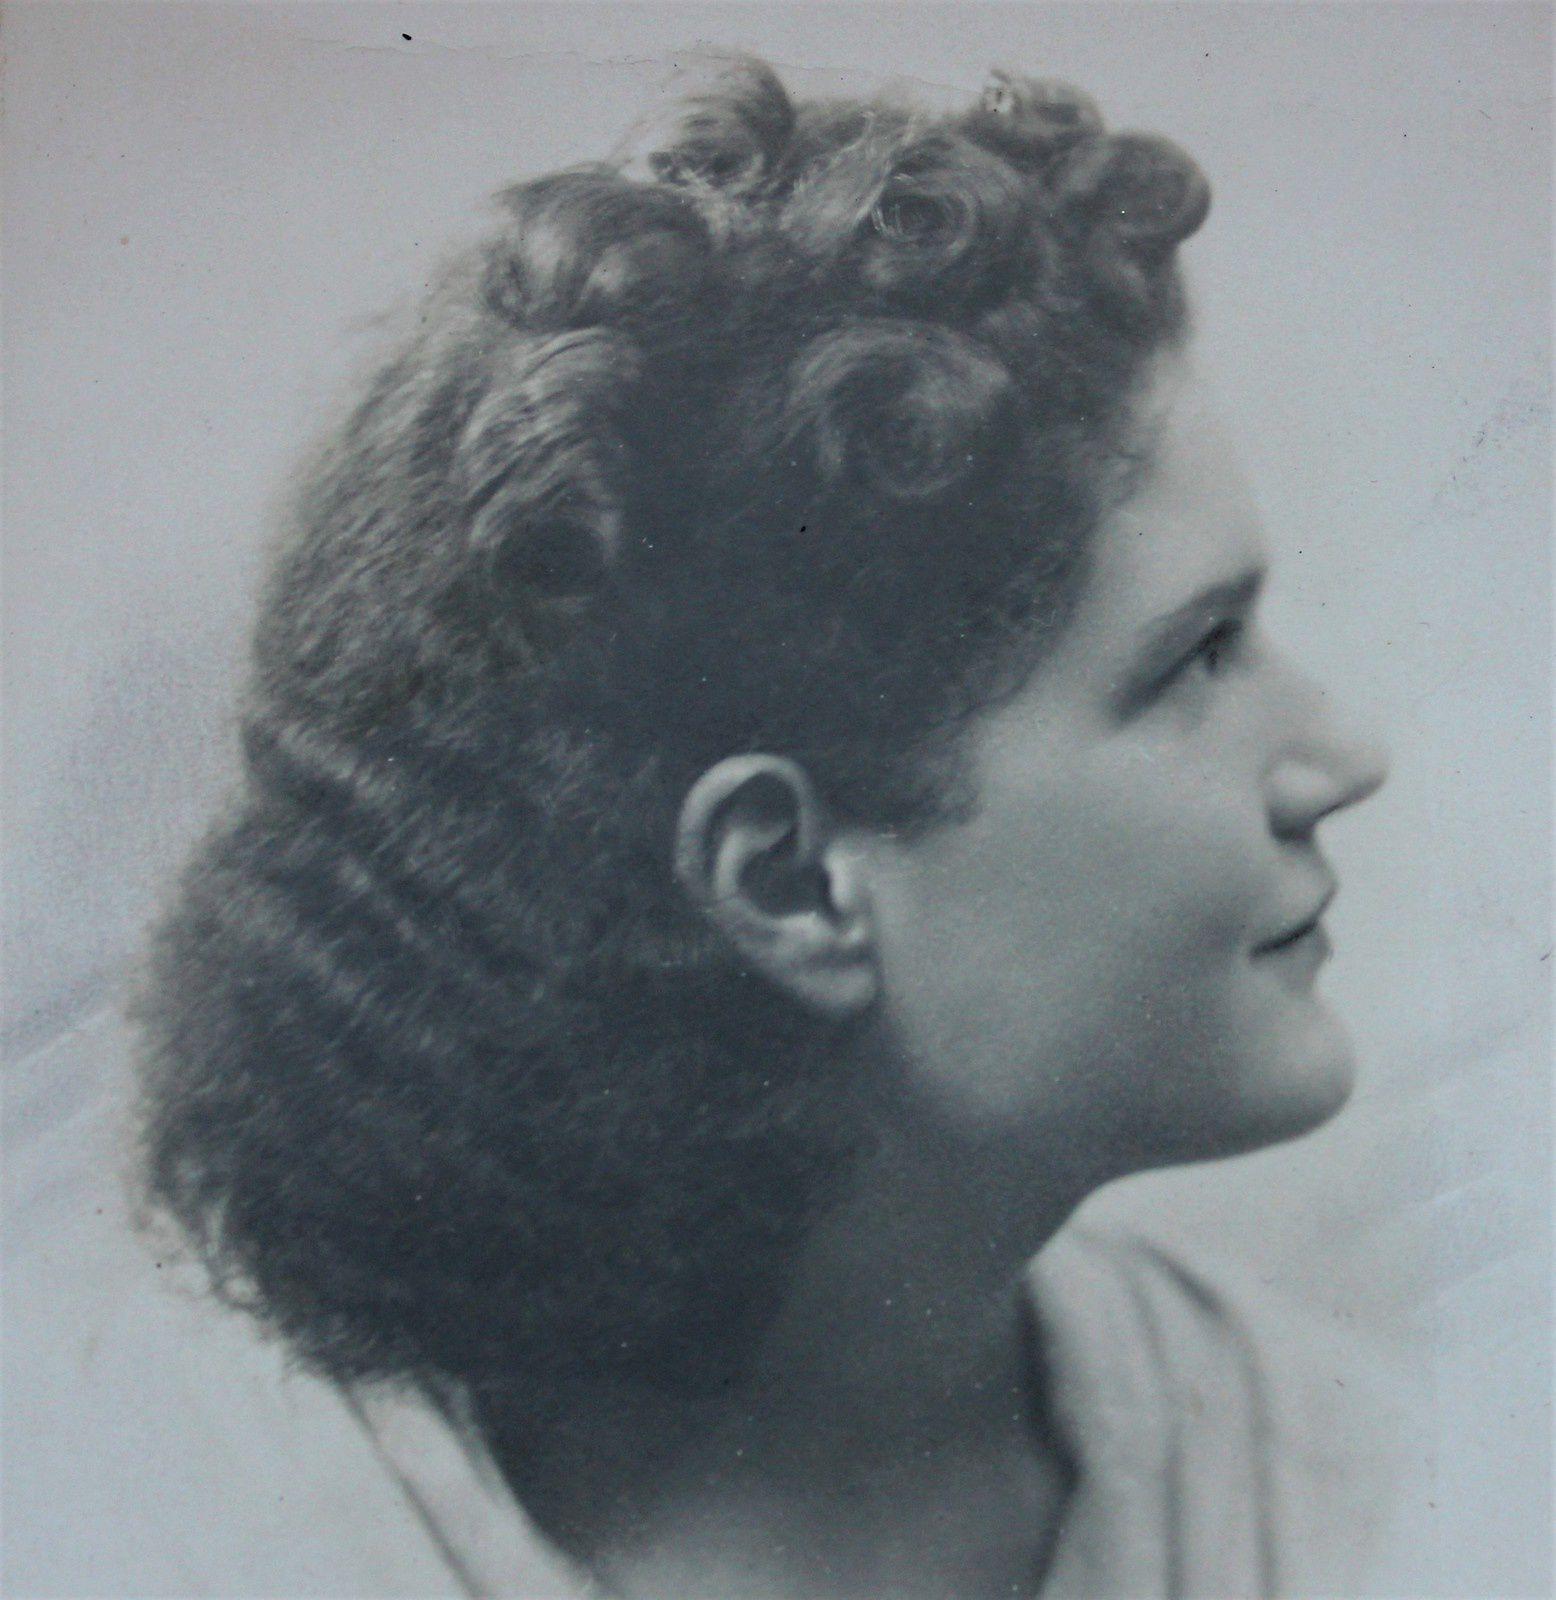 Maman bientôt 98 ans. EHPAD des Lilas.